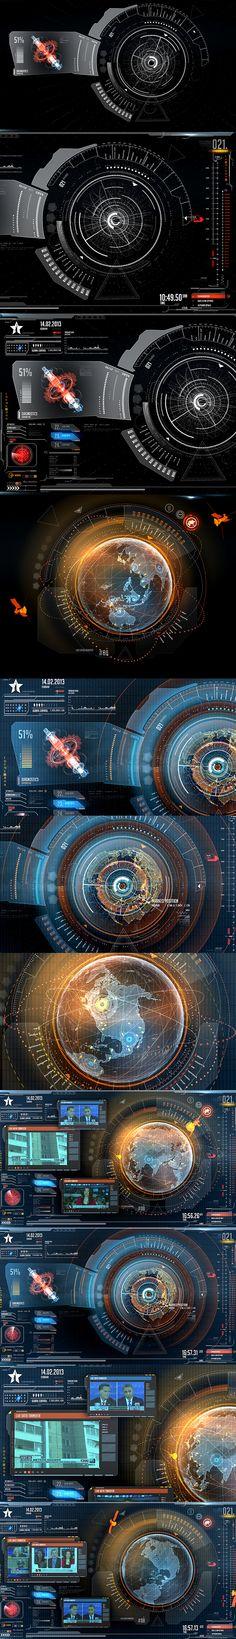 2RISE - FUTURE INTERFACE on Behance